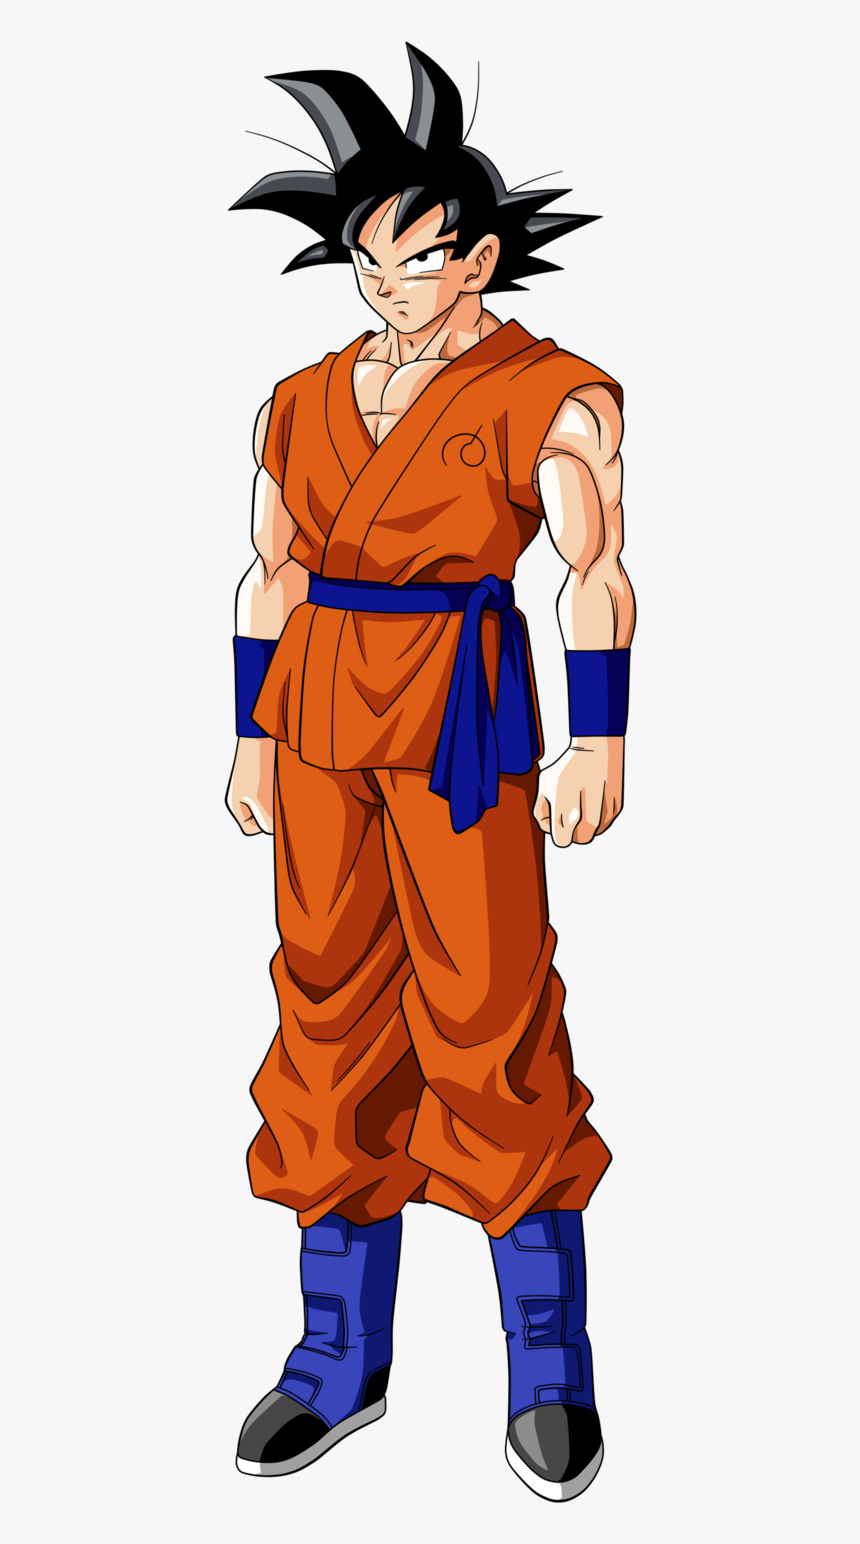 Goku Whis Symbol Gi , Png Download - Dragon Ball Goku Super Png, Transparent Png, Free Download